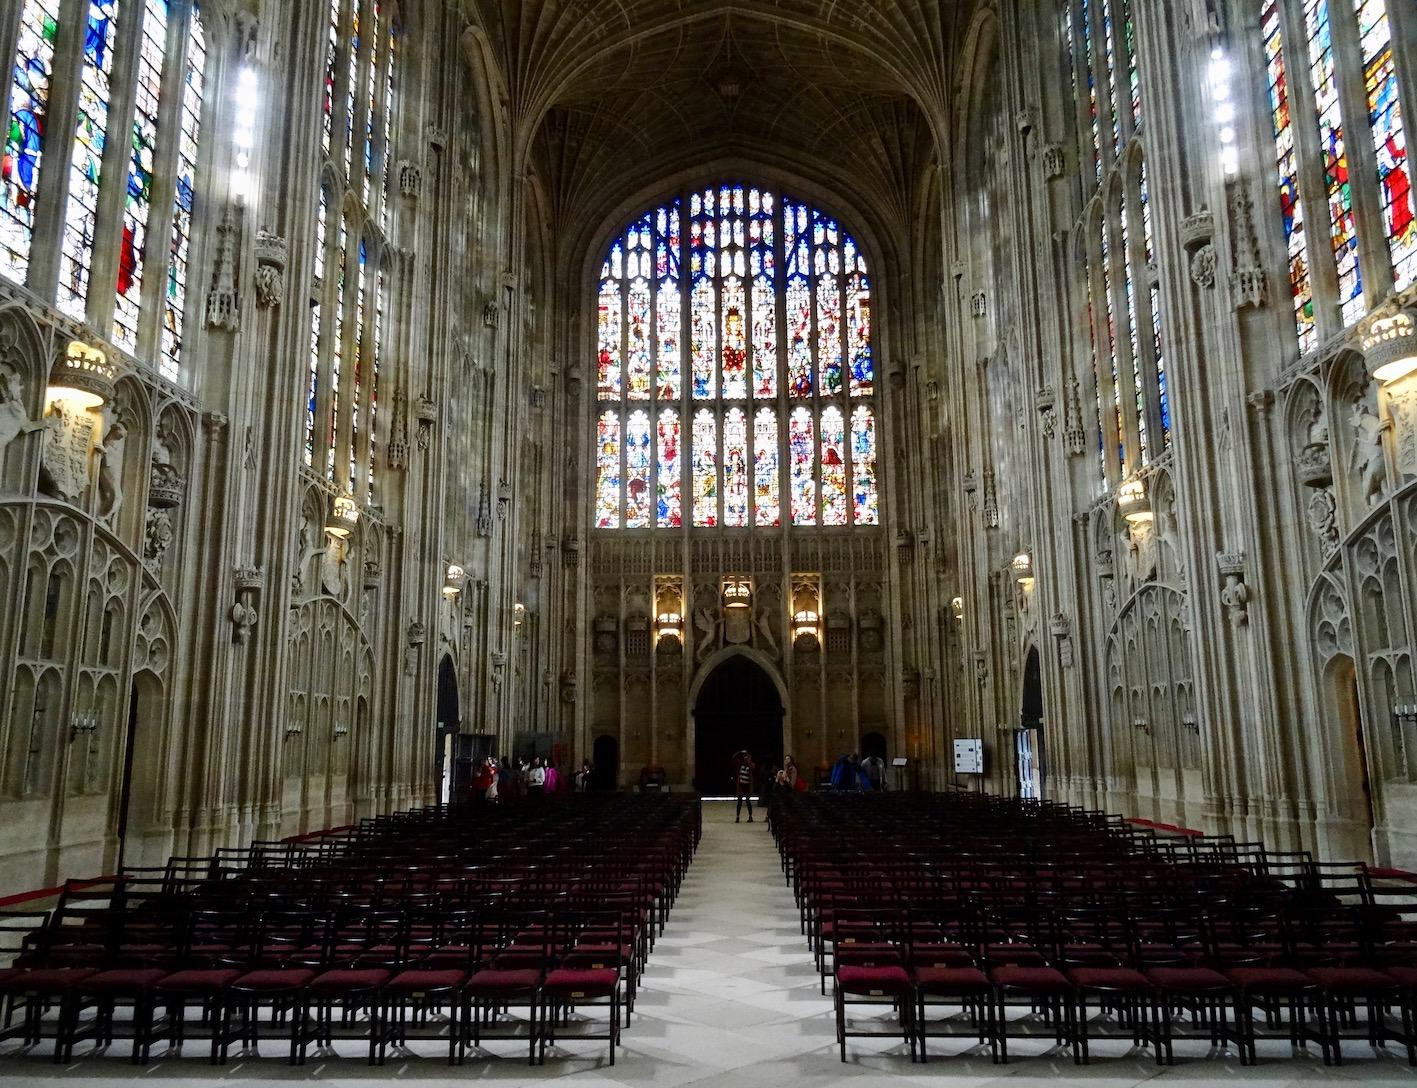 Inside King's College Chapel in Cambridge.